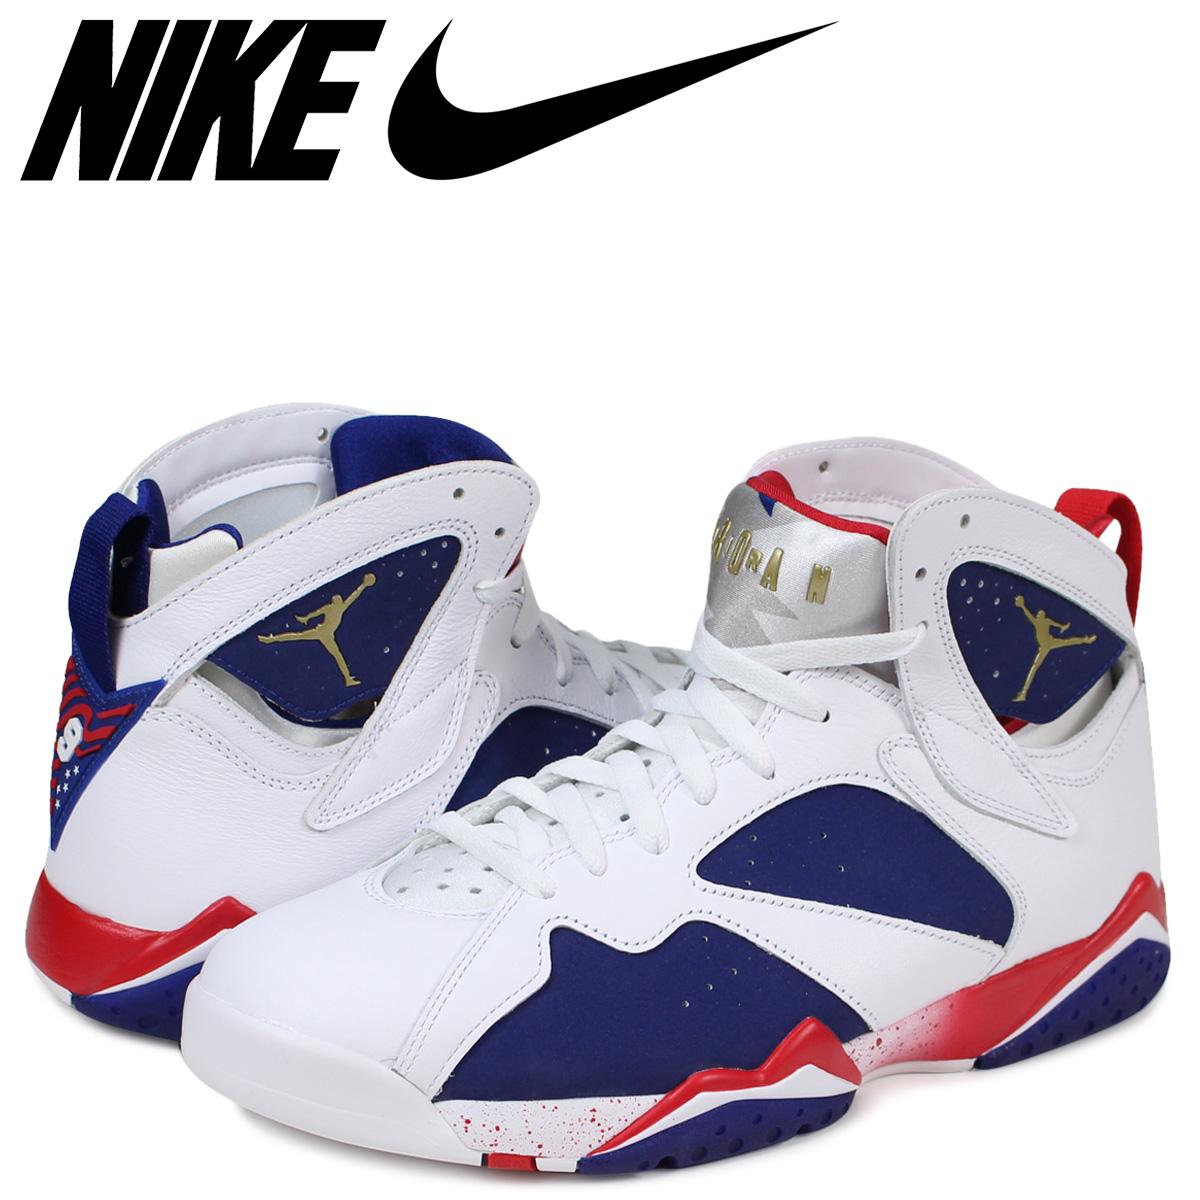 ad6a4a04d5c Sugar Online Shop: NIKE Nike Air Jordan 7 nostalgic sneakers AIR JORDAN 7  RETRO OLYMPIC ALTERNATE 304,775-123 men's white white   Rakuten Global  Market